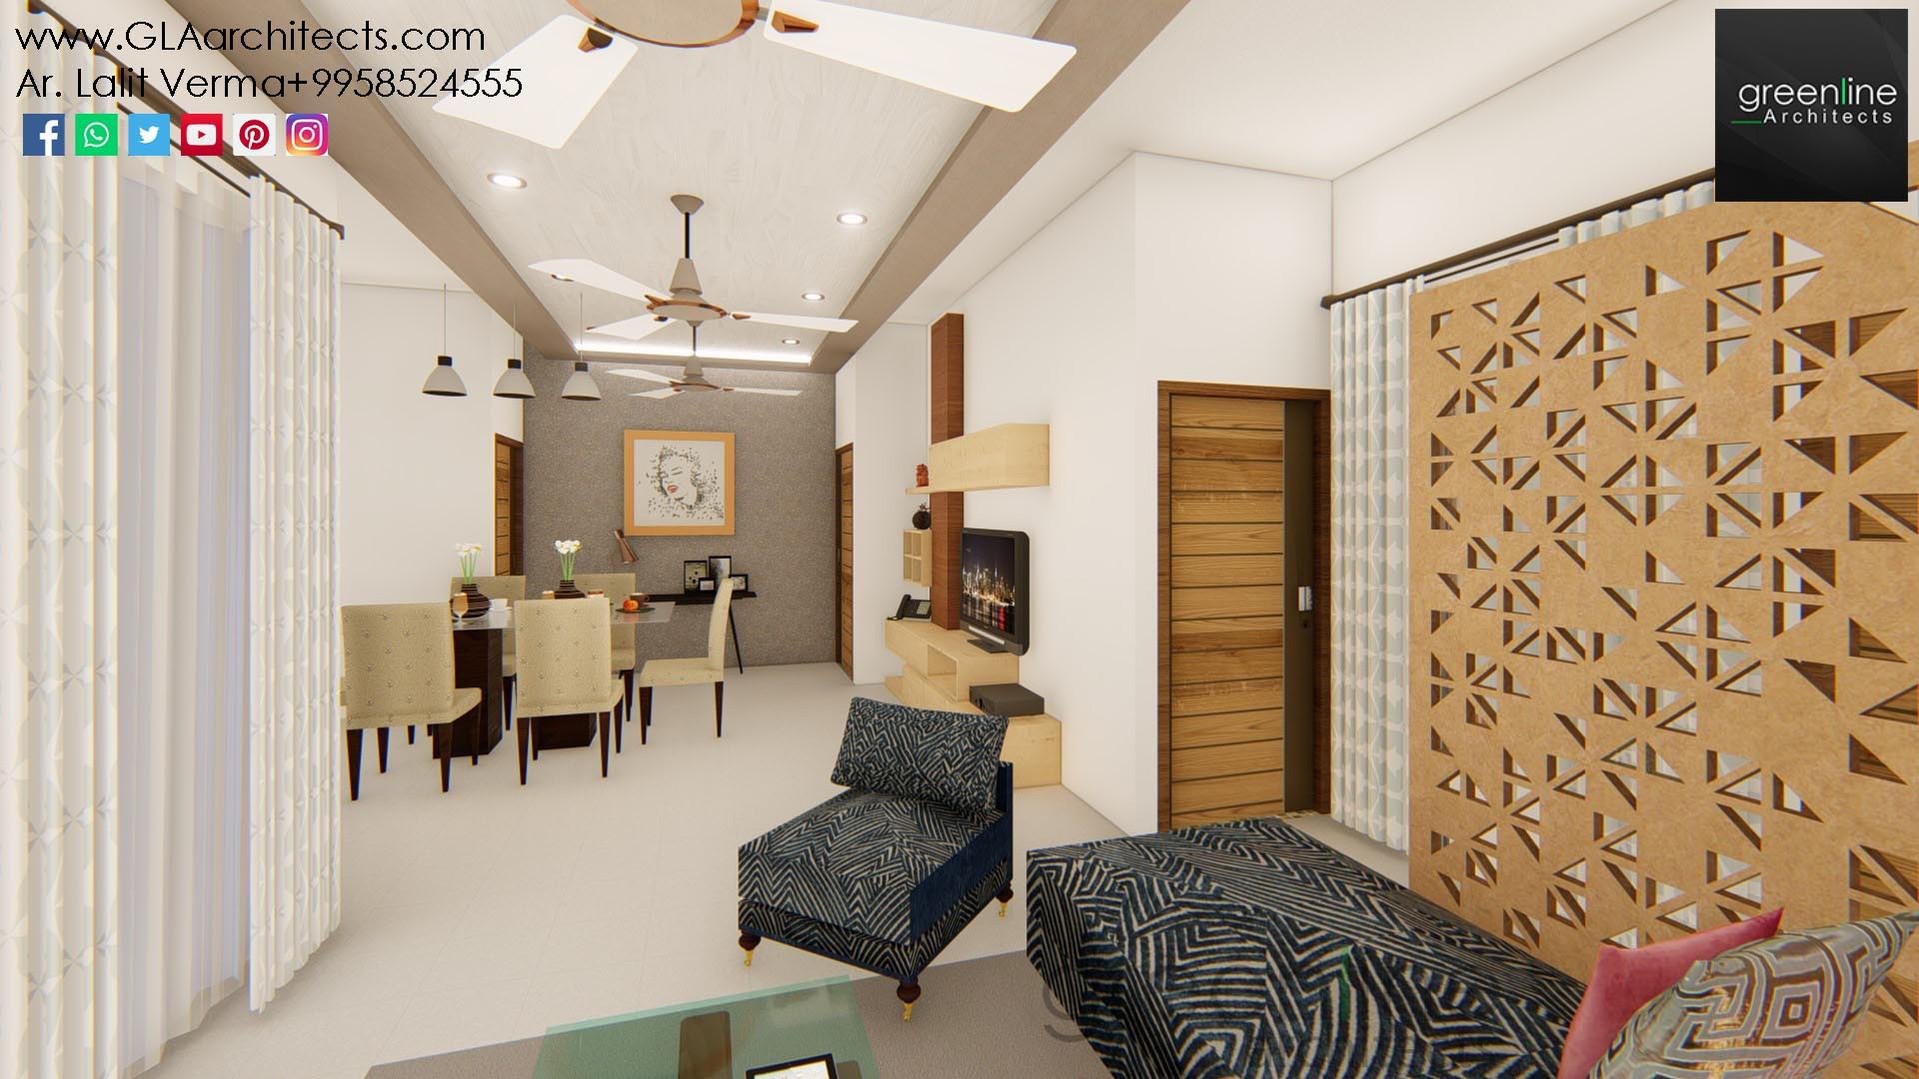 3 BHK-Apartment_Home Interior (5).jpg